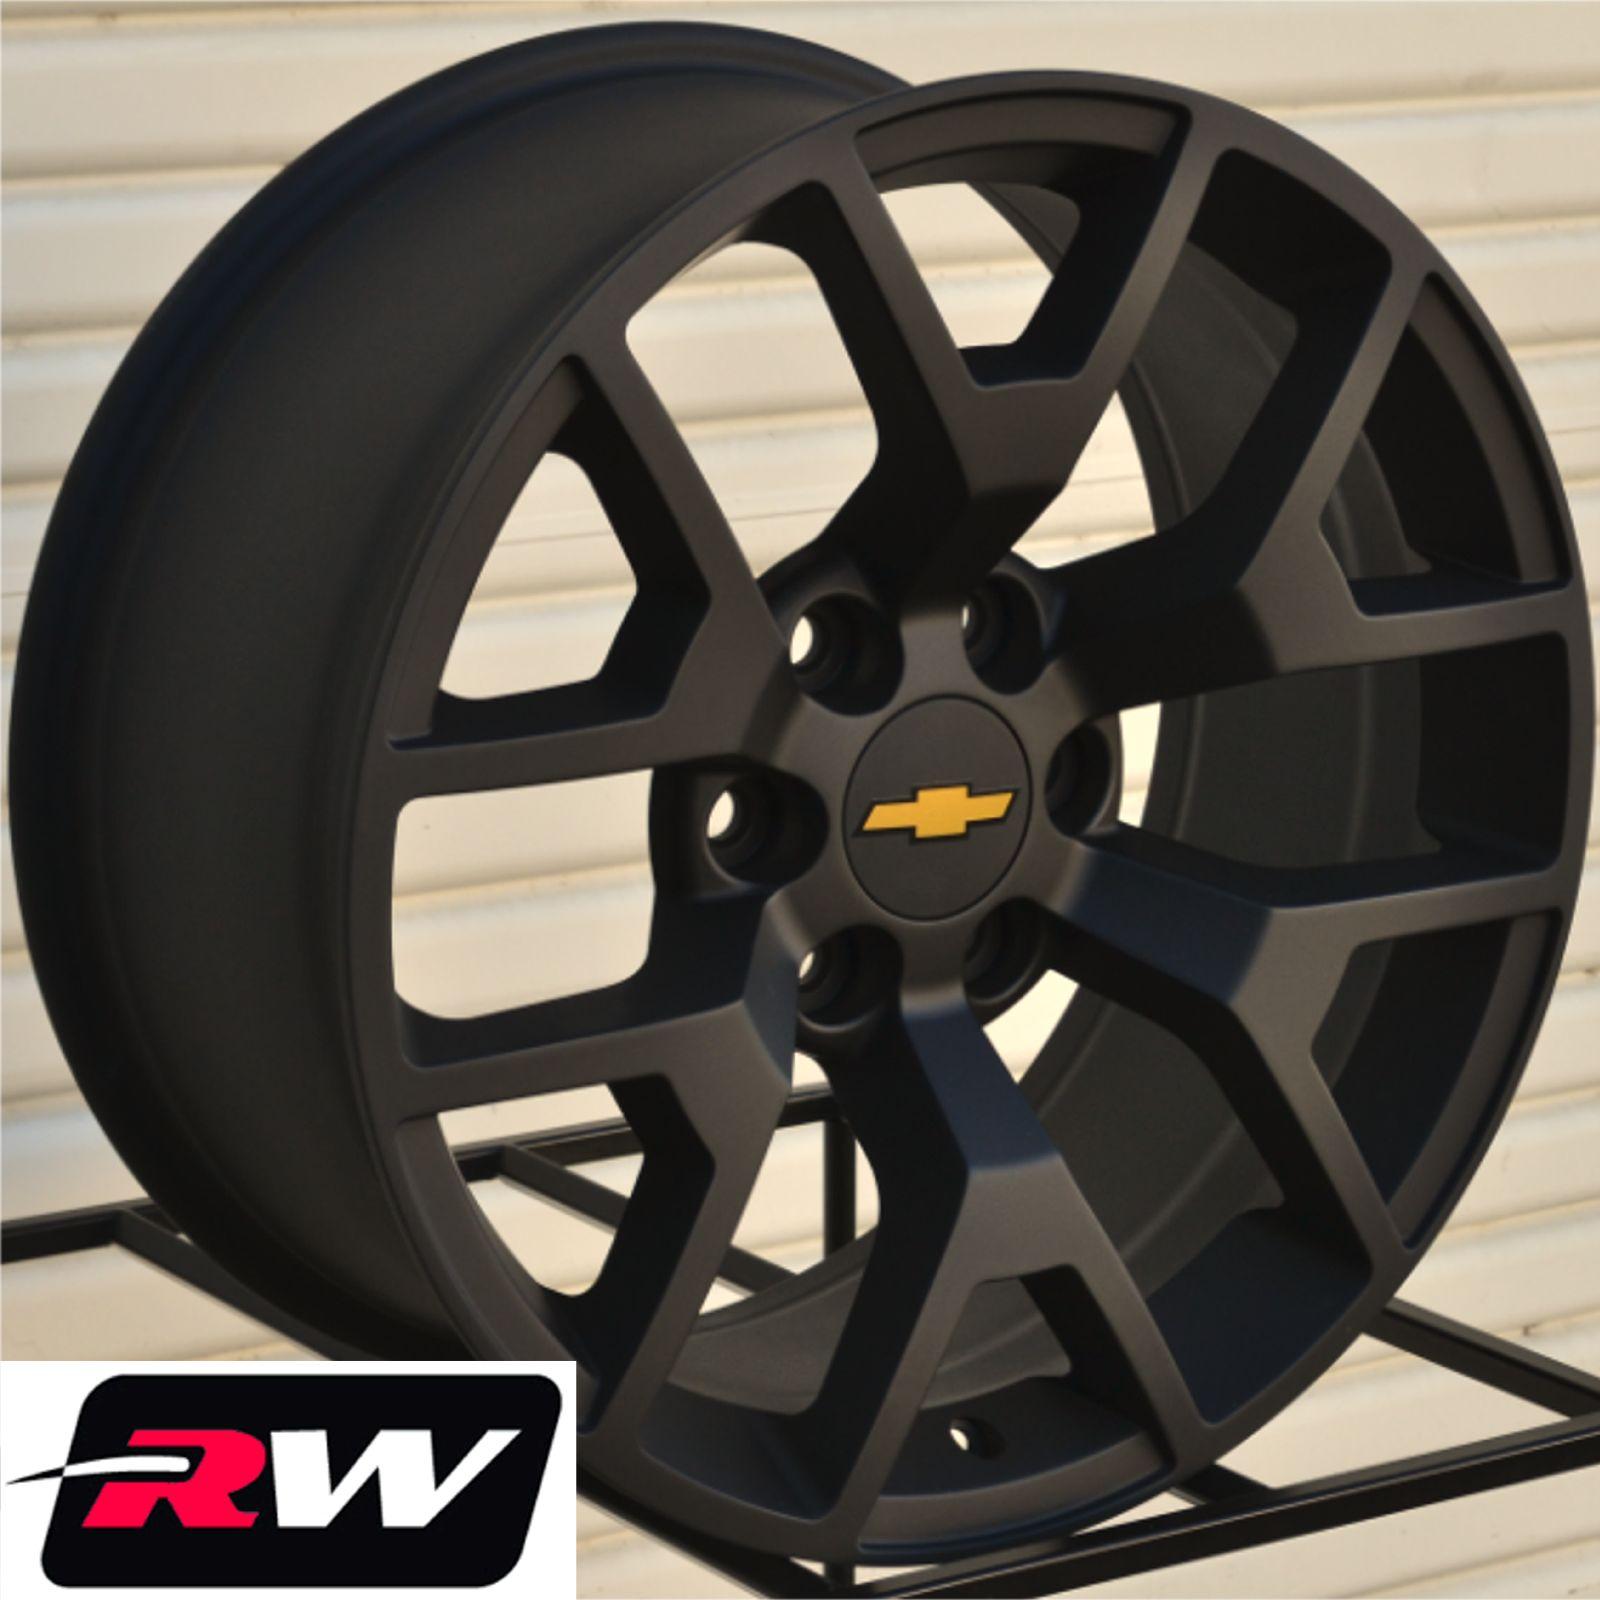 50 Inch Rims On Chevy : Gmc sierra wheels matte black quot inch chevy